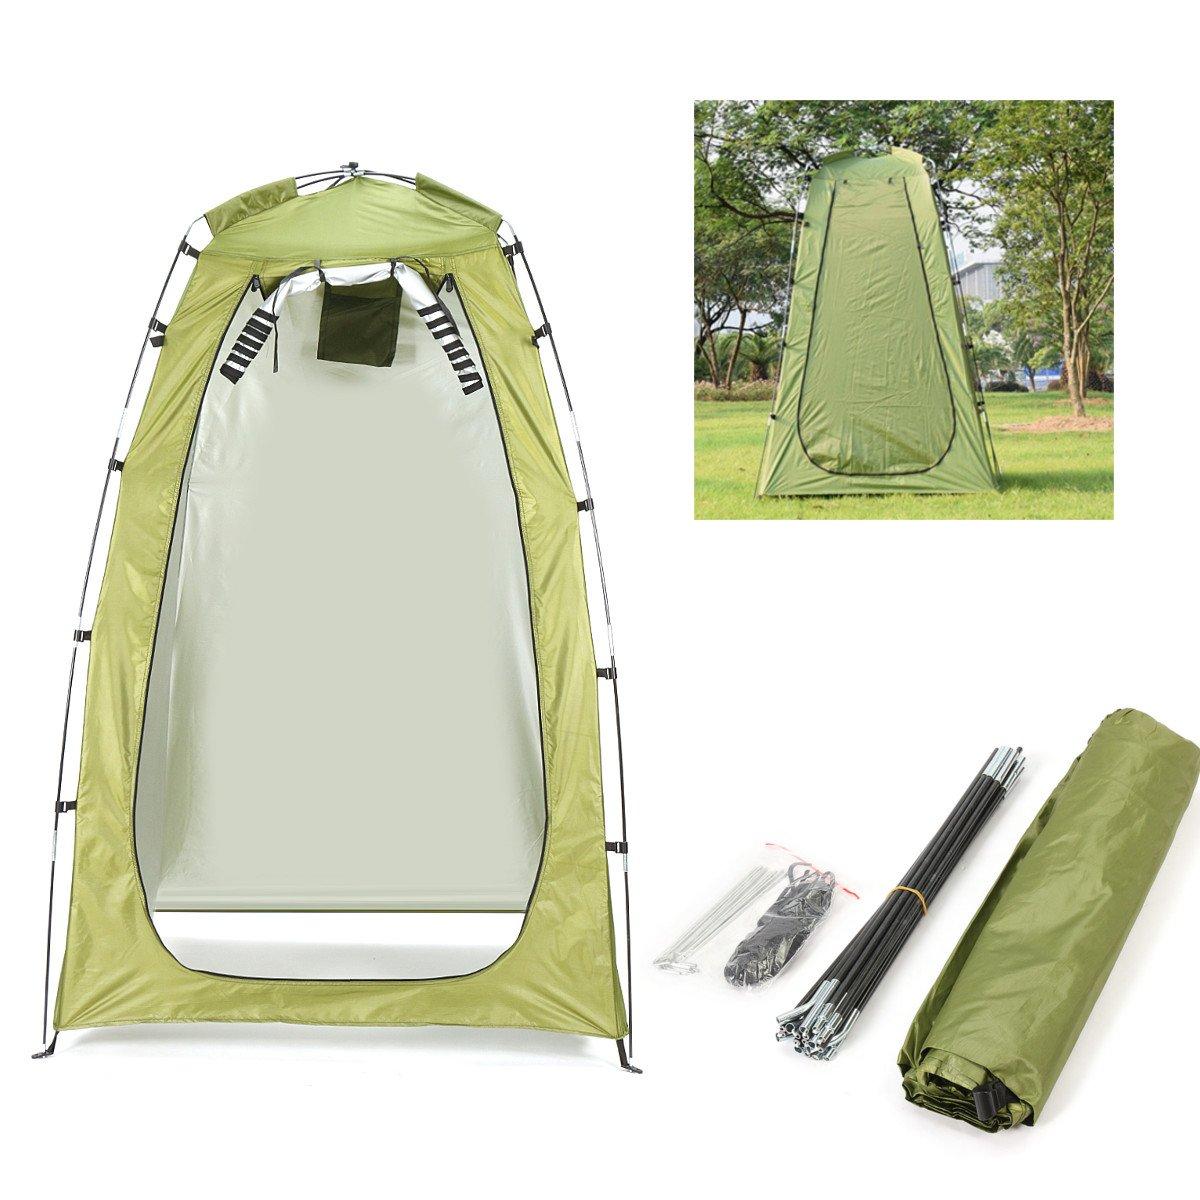 LaDicha Outdoor Portable Pop-Up Zelt Camping Dusche Badezimmer Privatsphäre Wc Umkleideraum